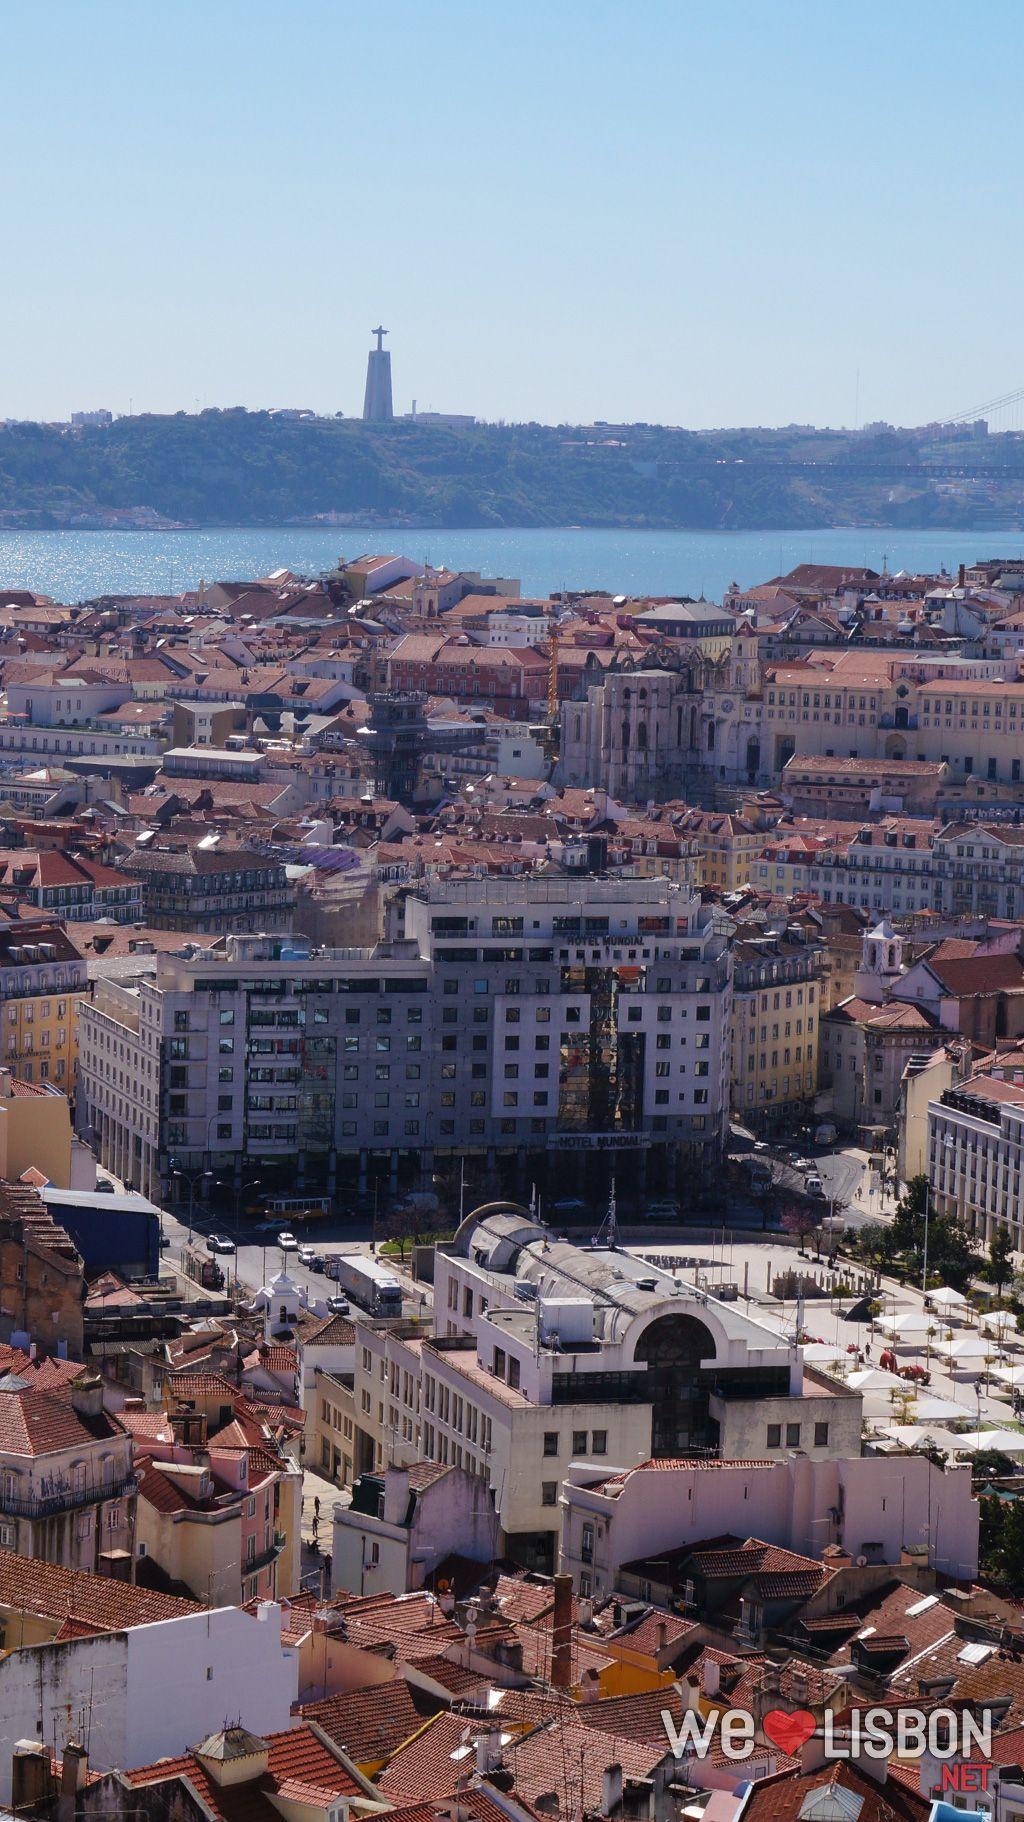 Miradouro Nossa Senhora Do Monte Activities Lisbon Lisbon Great View Sightseeing